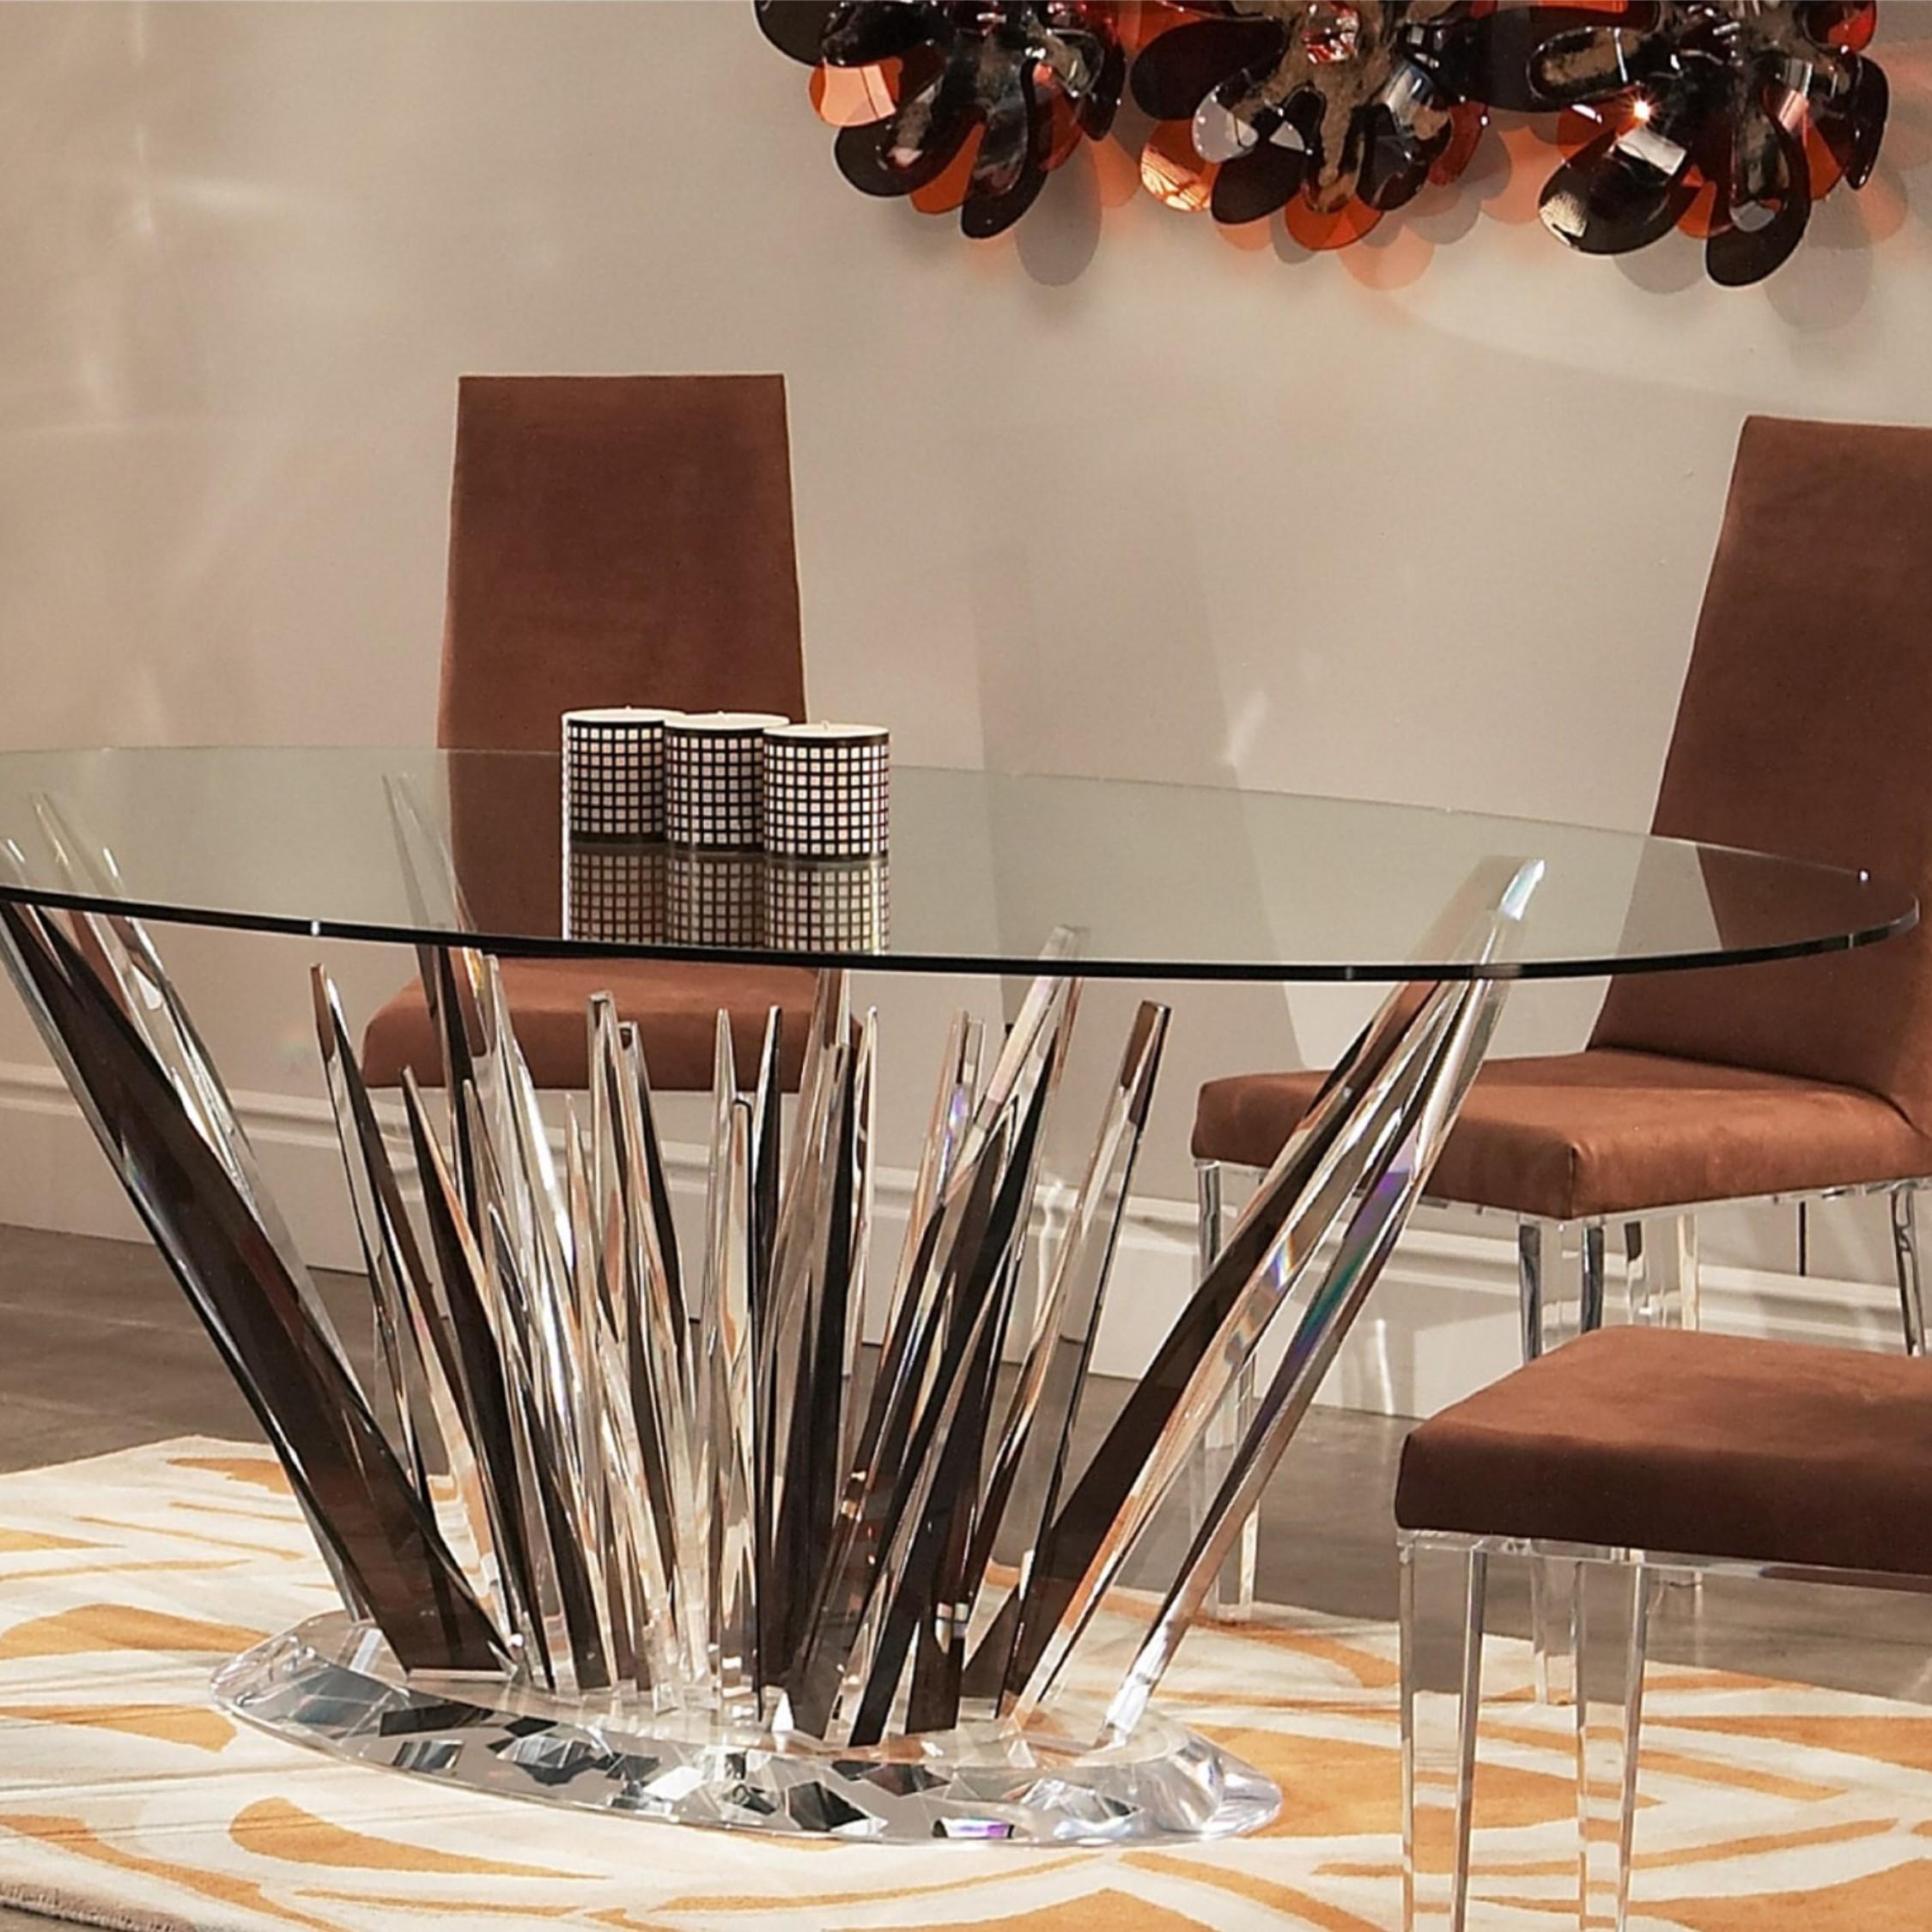 Elegant Acrylic Tables Designer Acrylic Table For Home Shahrooz Art